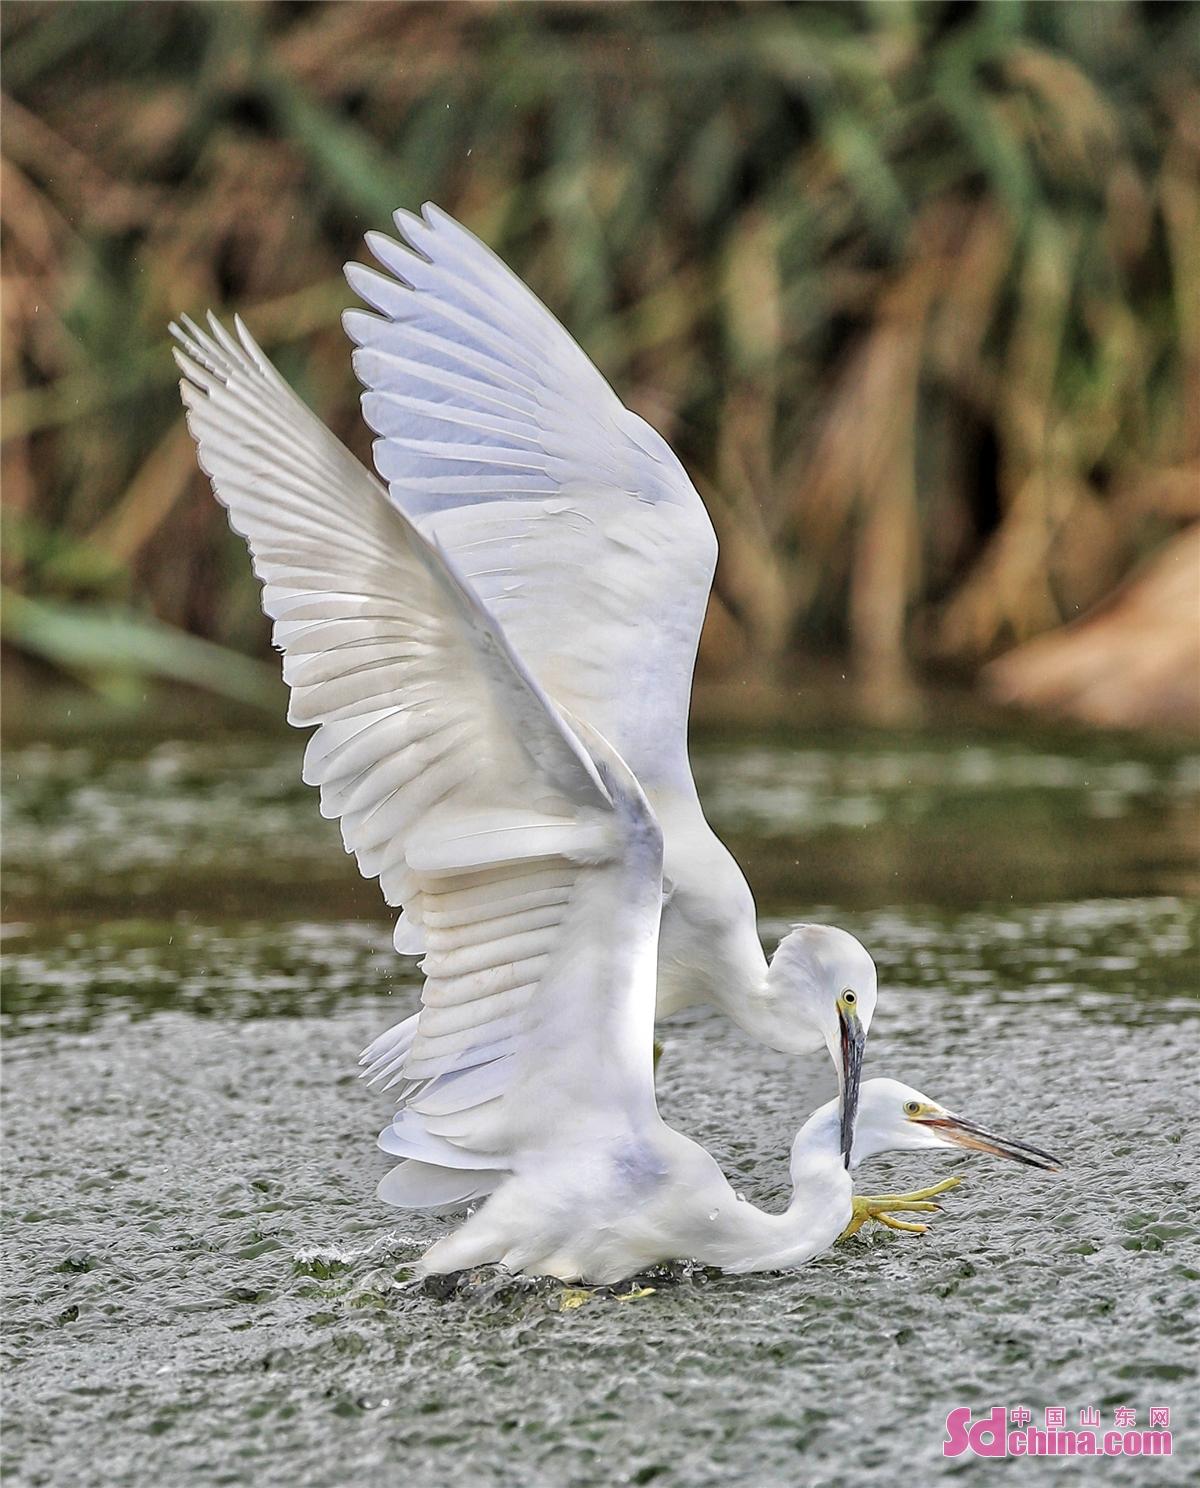 <br/>  최근 몇 년간 산동성 치박시 치천구 통합 관리를 지속 진행하여 하천의 자연환경을 개선되며 물이 맑아지고, 물고기 많아지고, 새를 찾아오고, 숲이 우거지는 모습이 들어낸다.